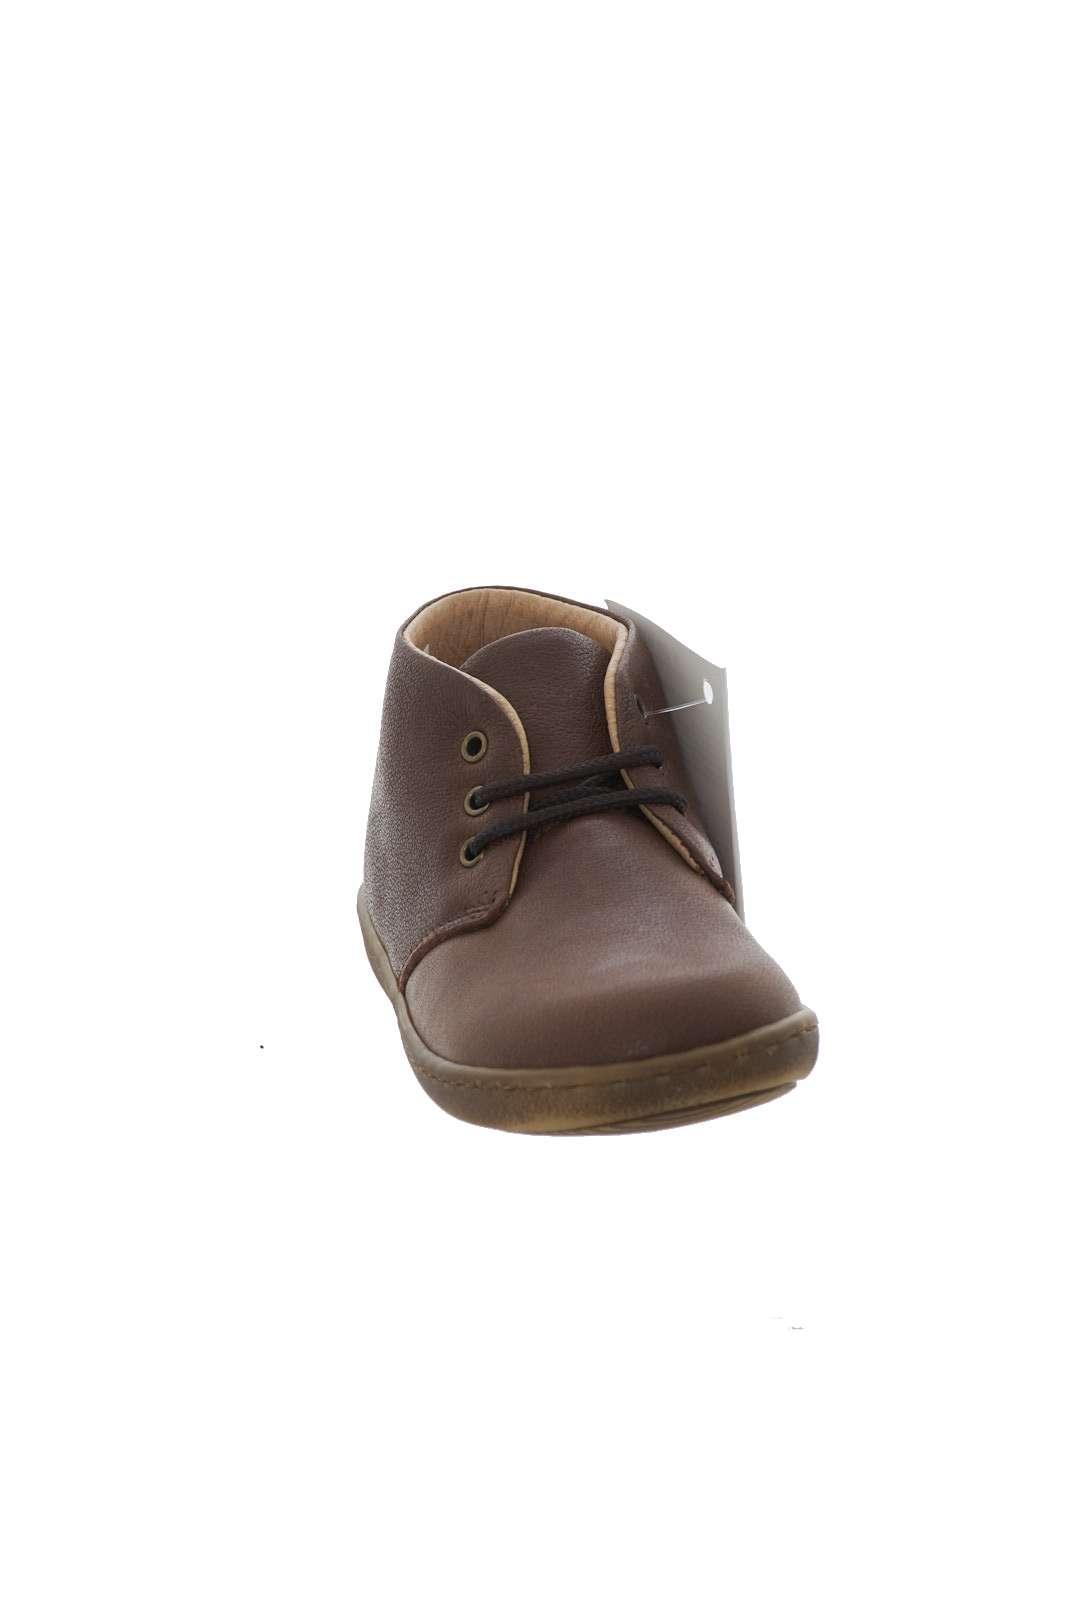 https://www.parmax.com/media/catalog/product/A/I/AI-outlet_parmax-scarpe-bambino-Gioiecologiche-3017-C.jpg